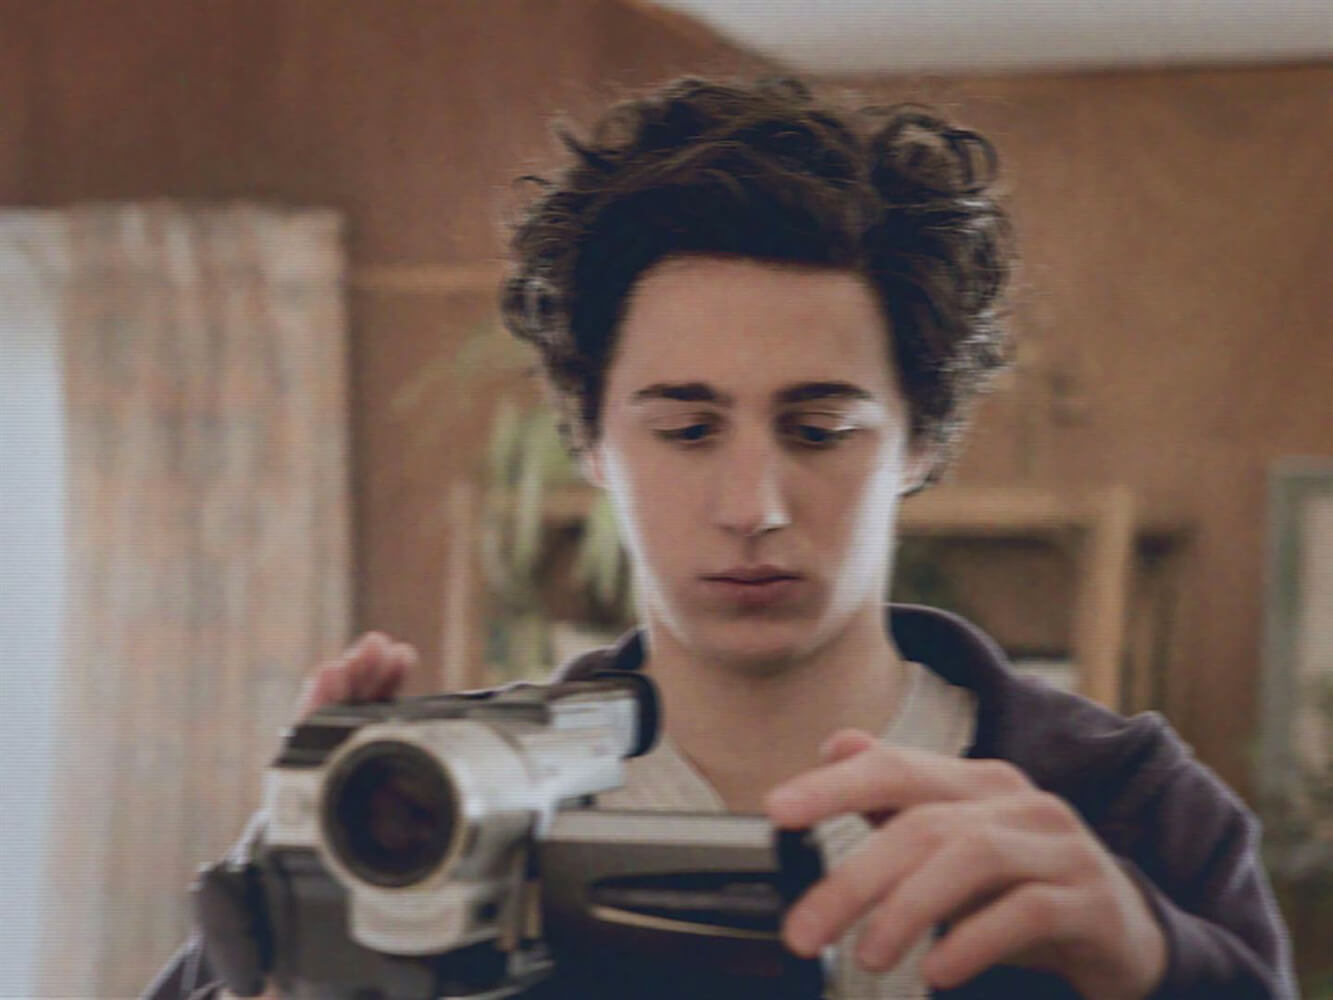 camera generation old school film comedie play